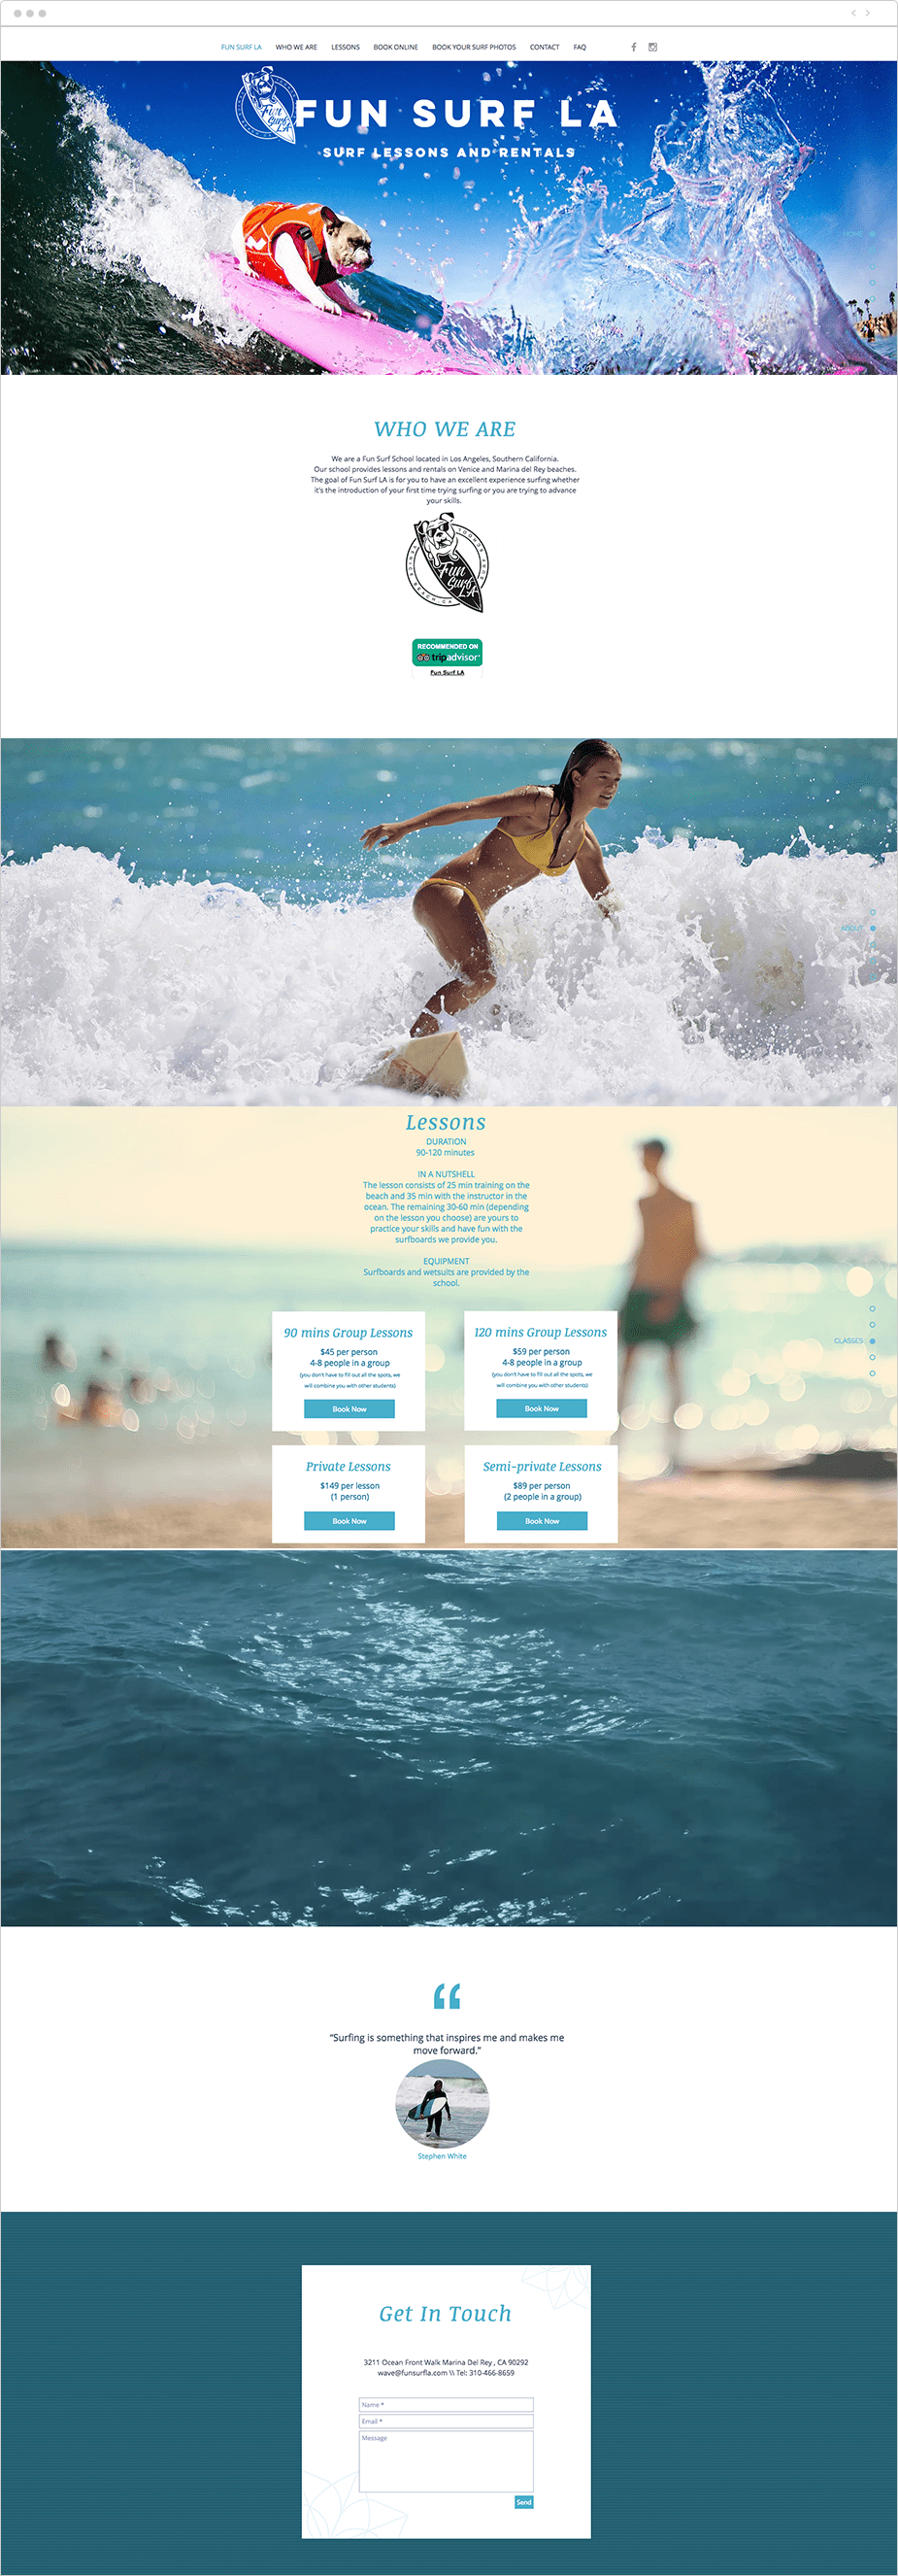 Site com Wix Bookings: Fun Surf LA